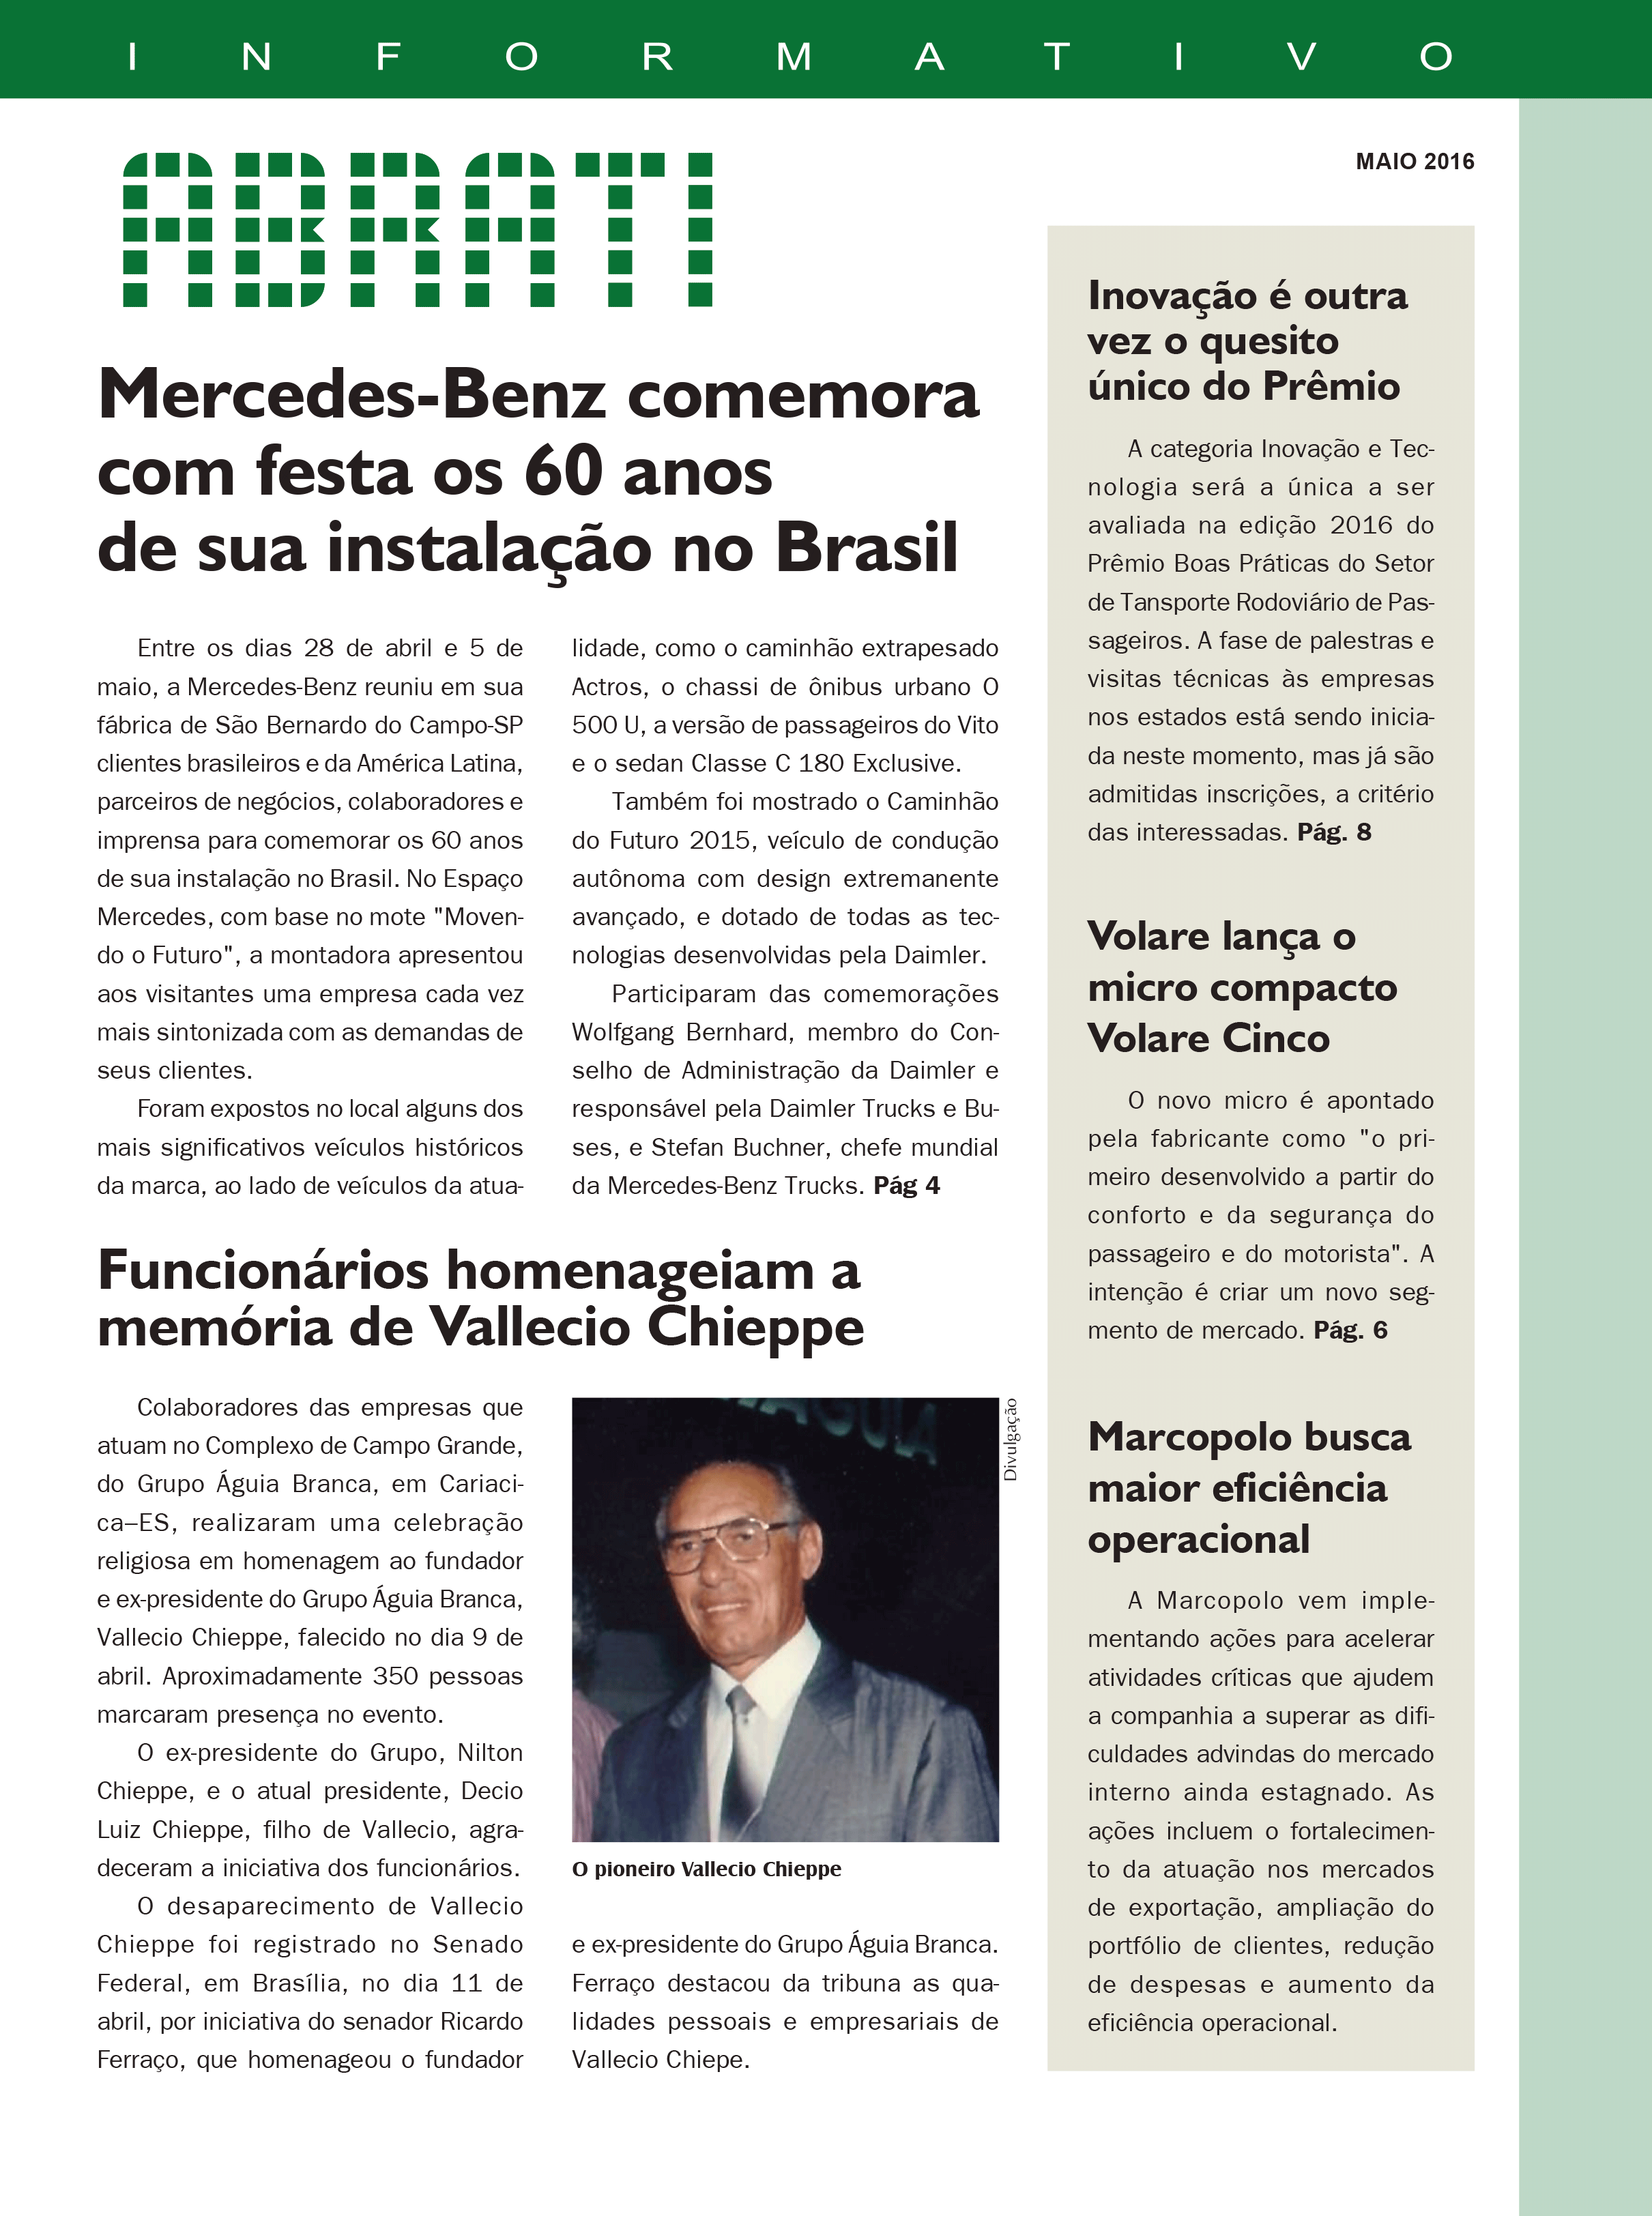 Informativo Maio 2016